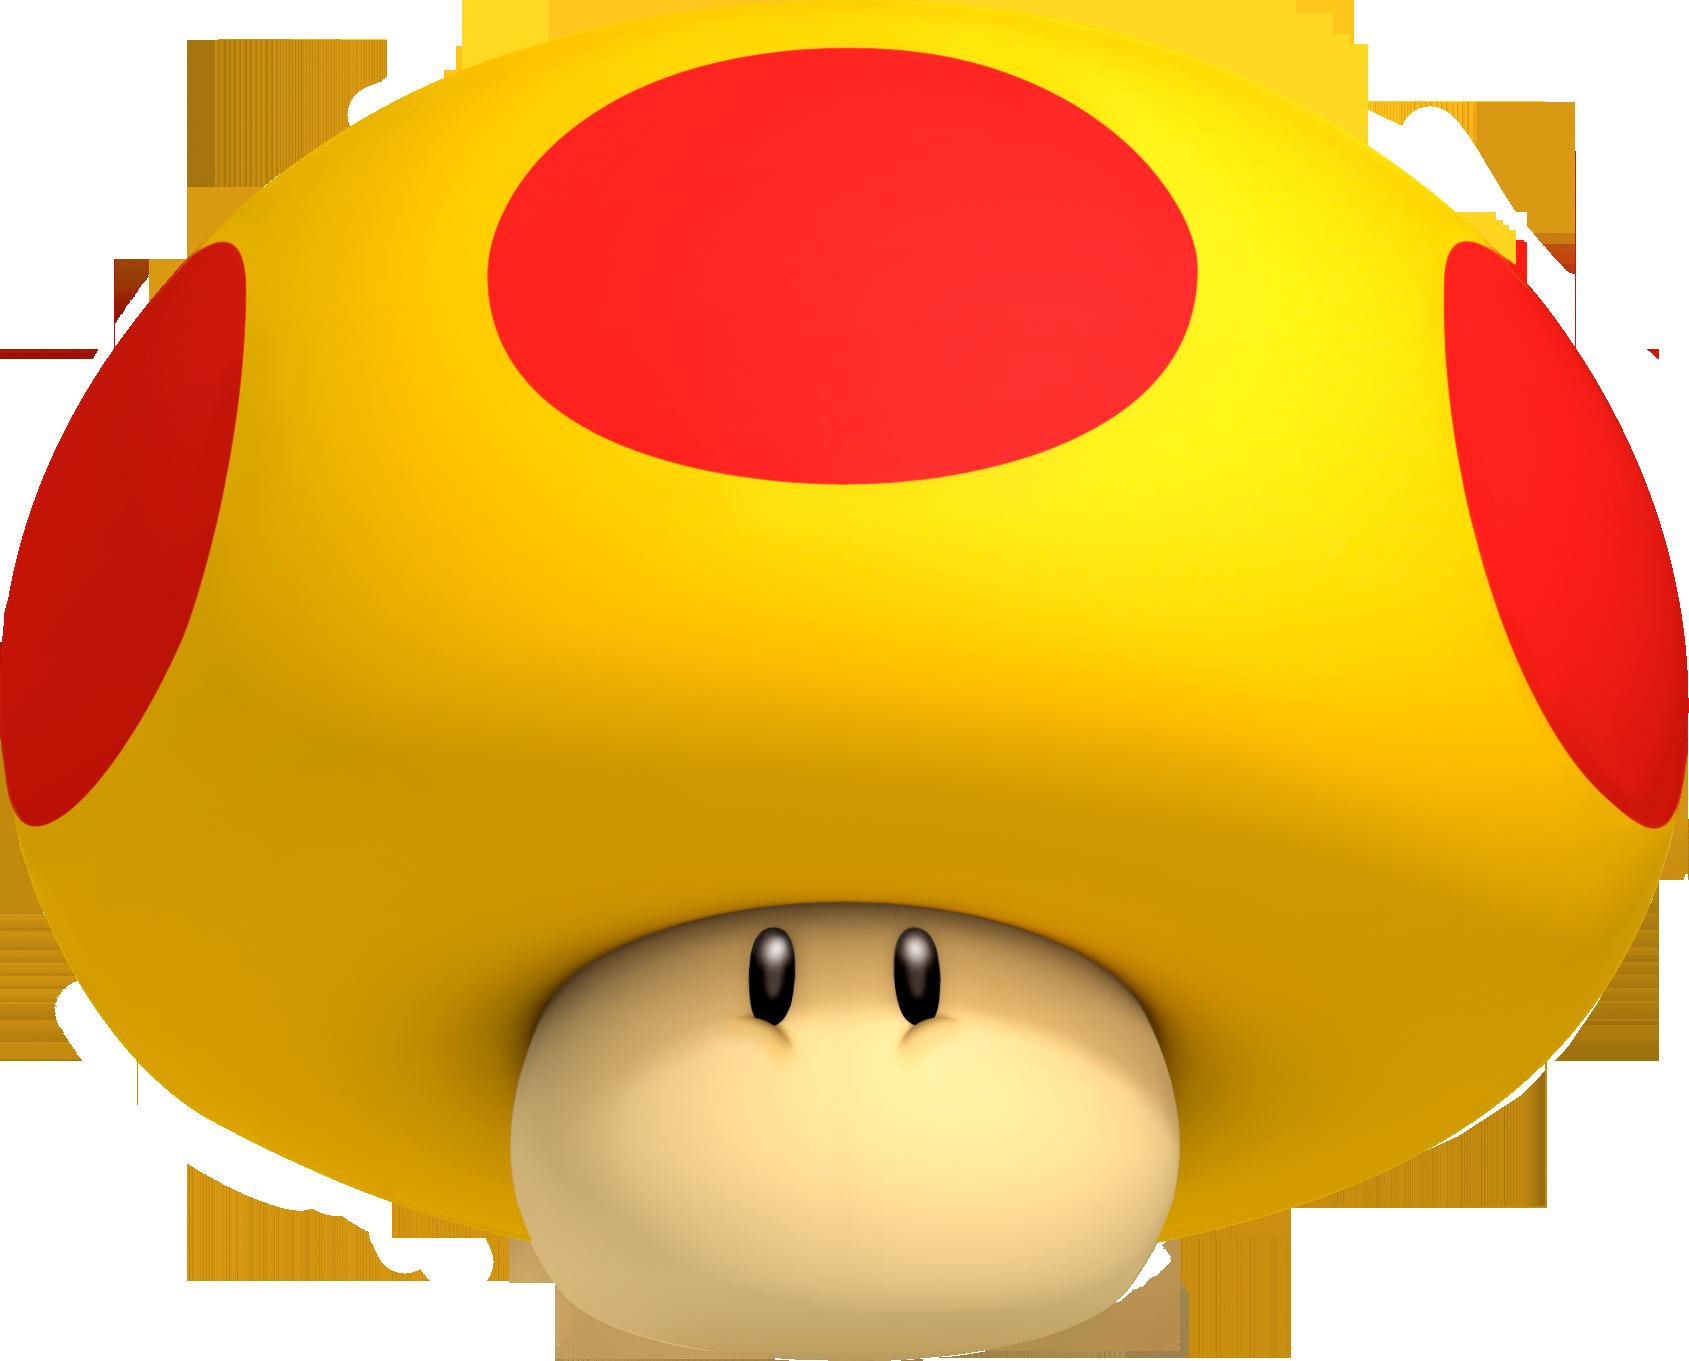 Super mario star eyes clipart clipart library New Super Mario Bros. 2 | Image - Mega Mushroom Artwork - New Super ... clipart library